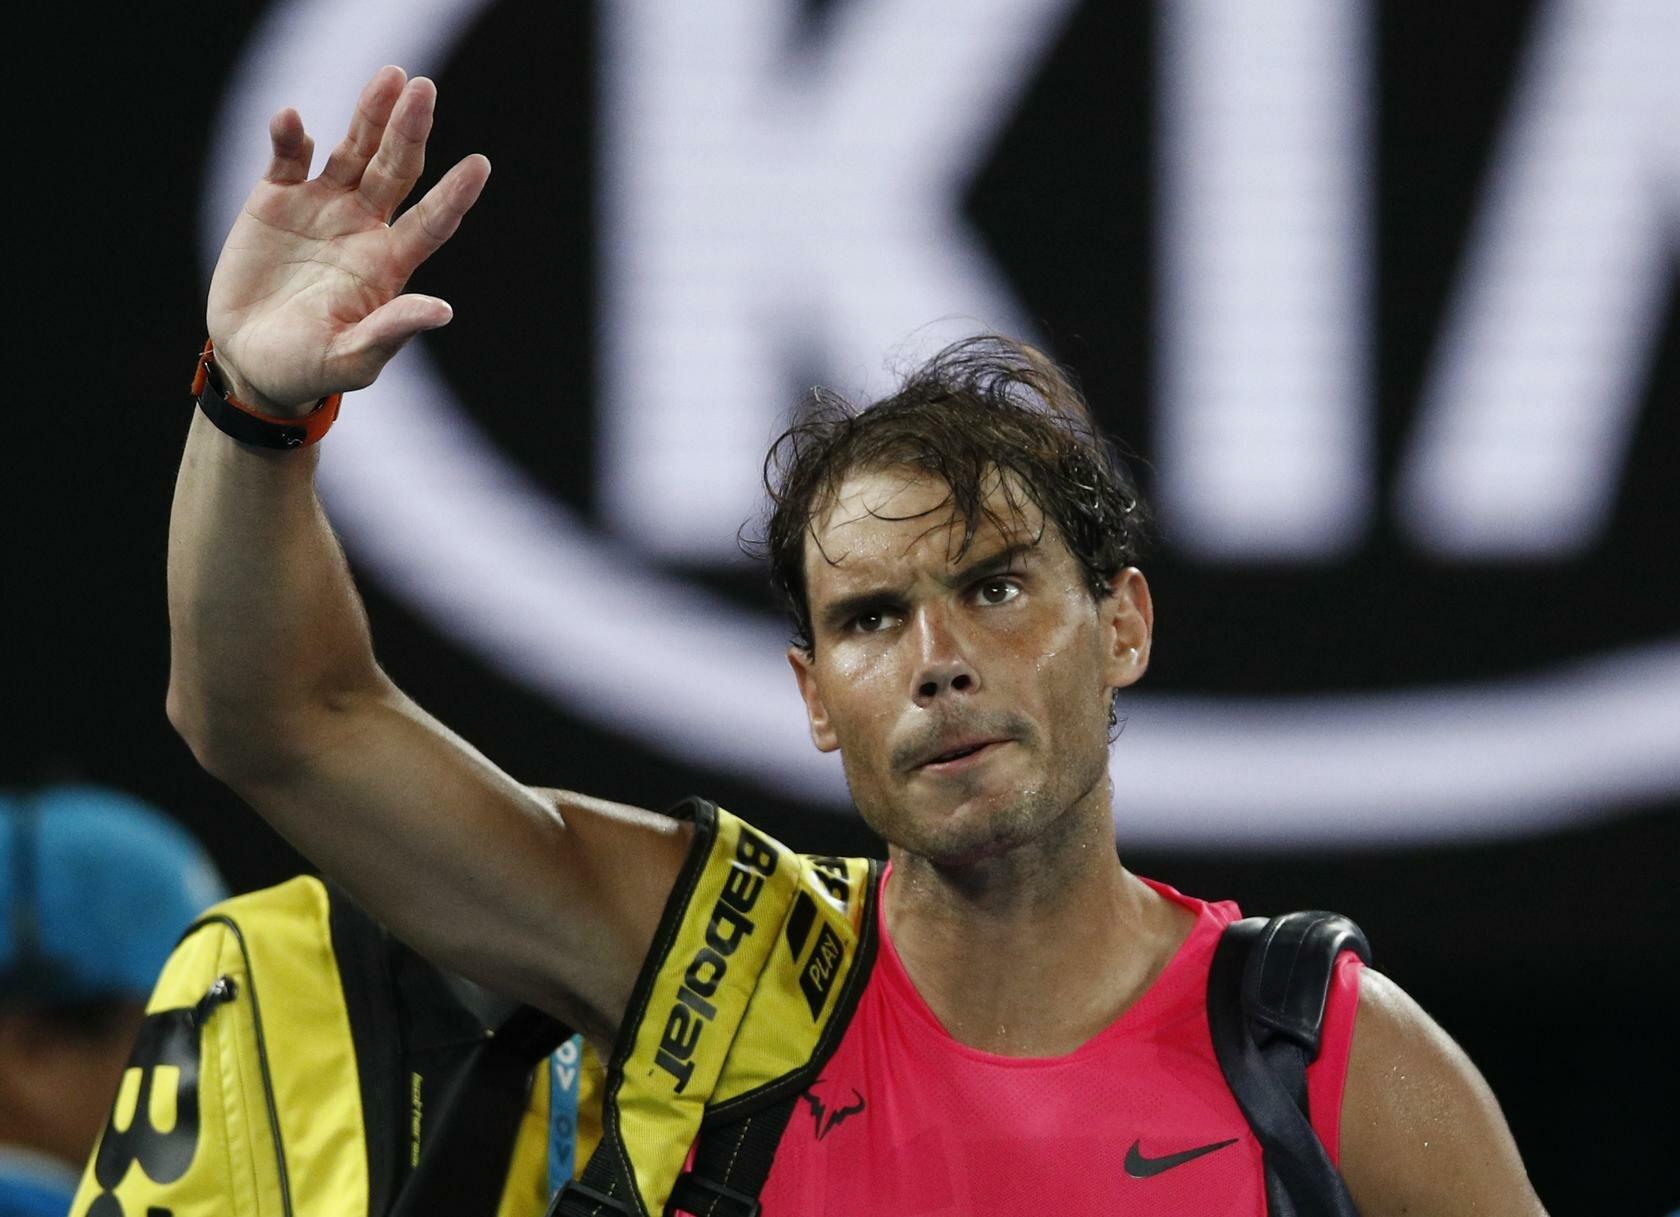 Nadal, Wawrinka Out Of Australian Open; Thiem, Zverev Keep Cruising